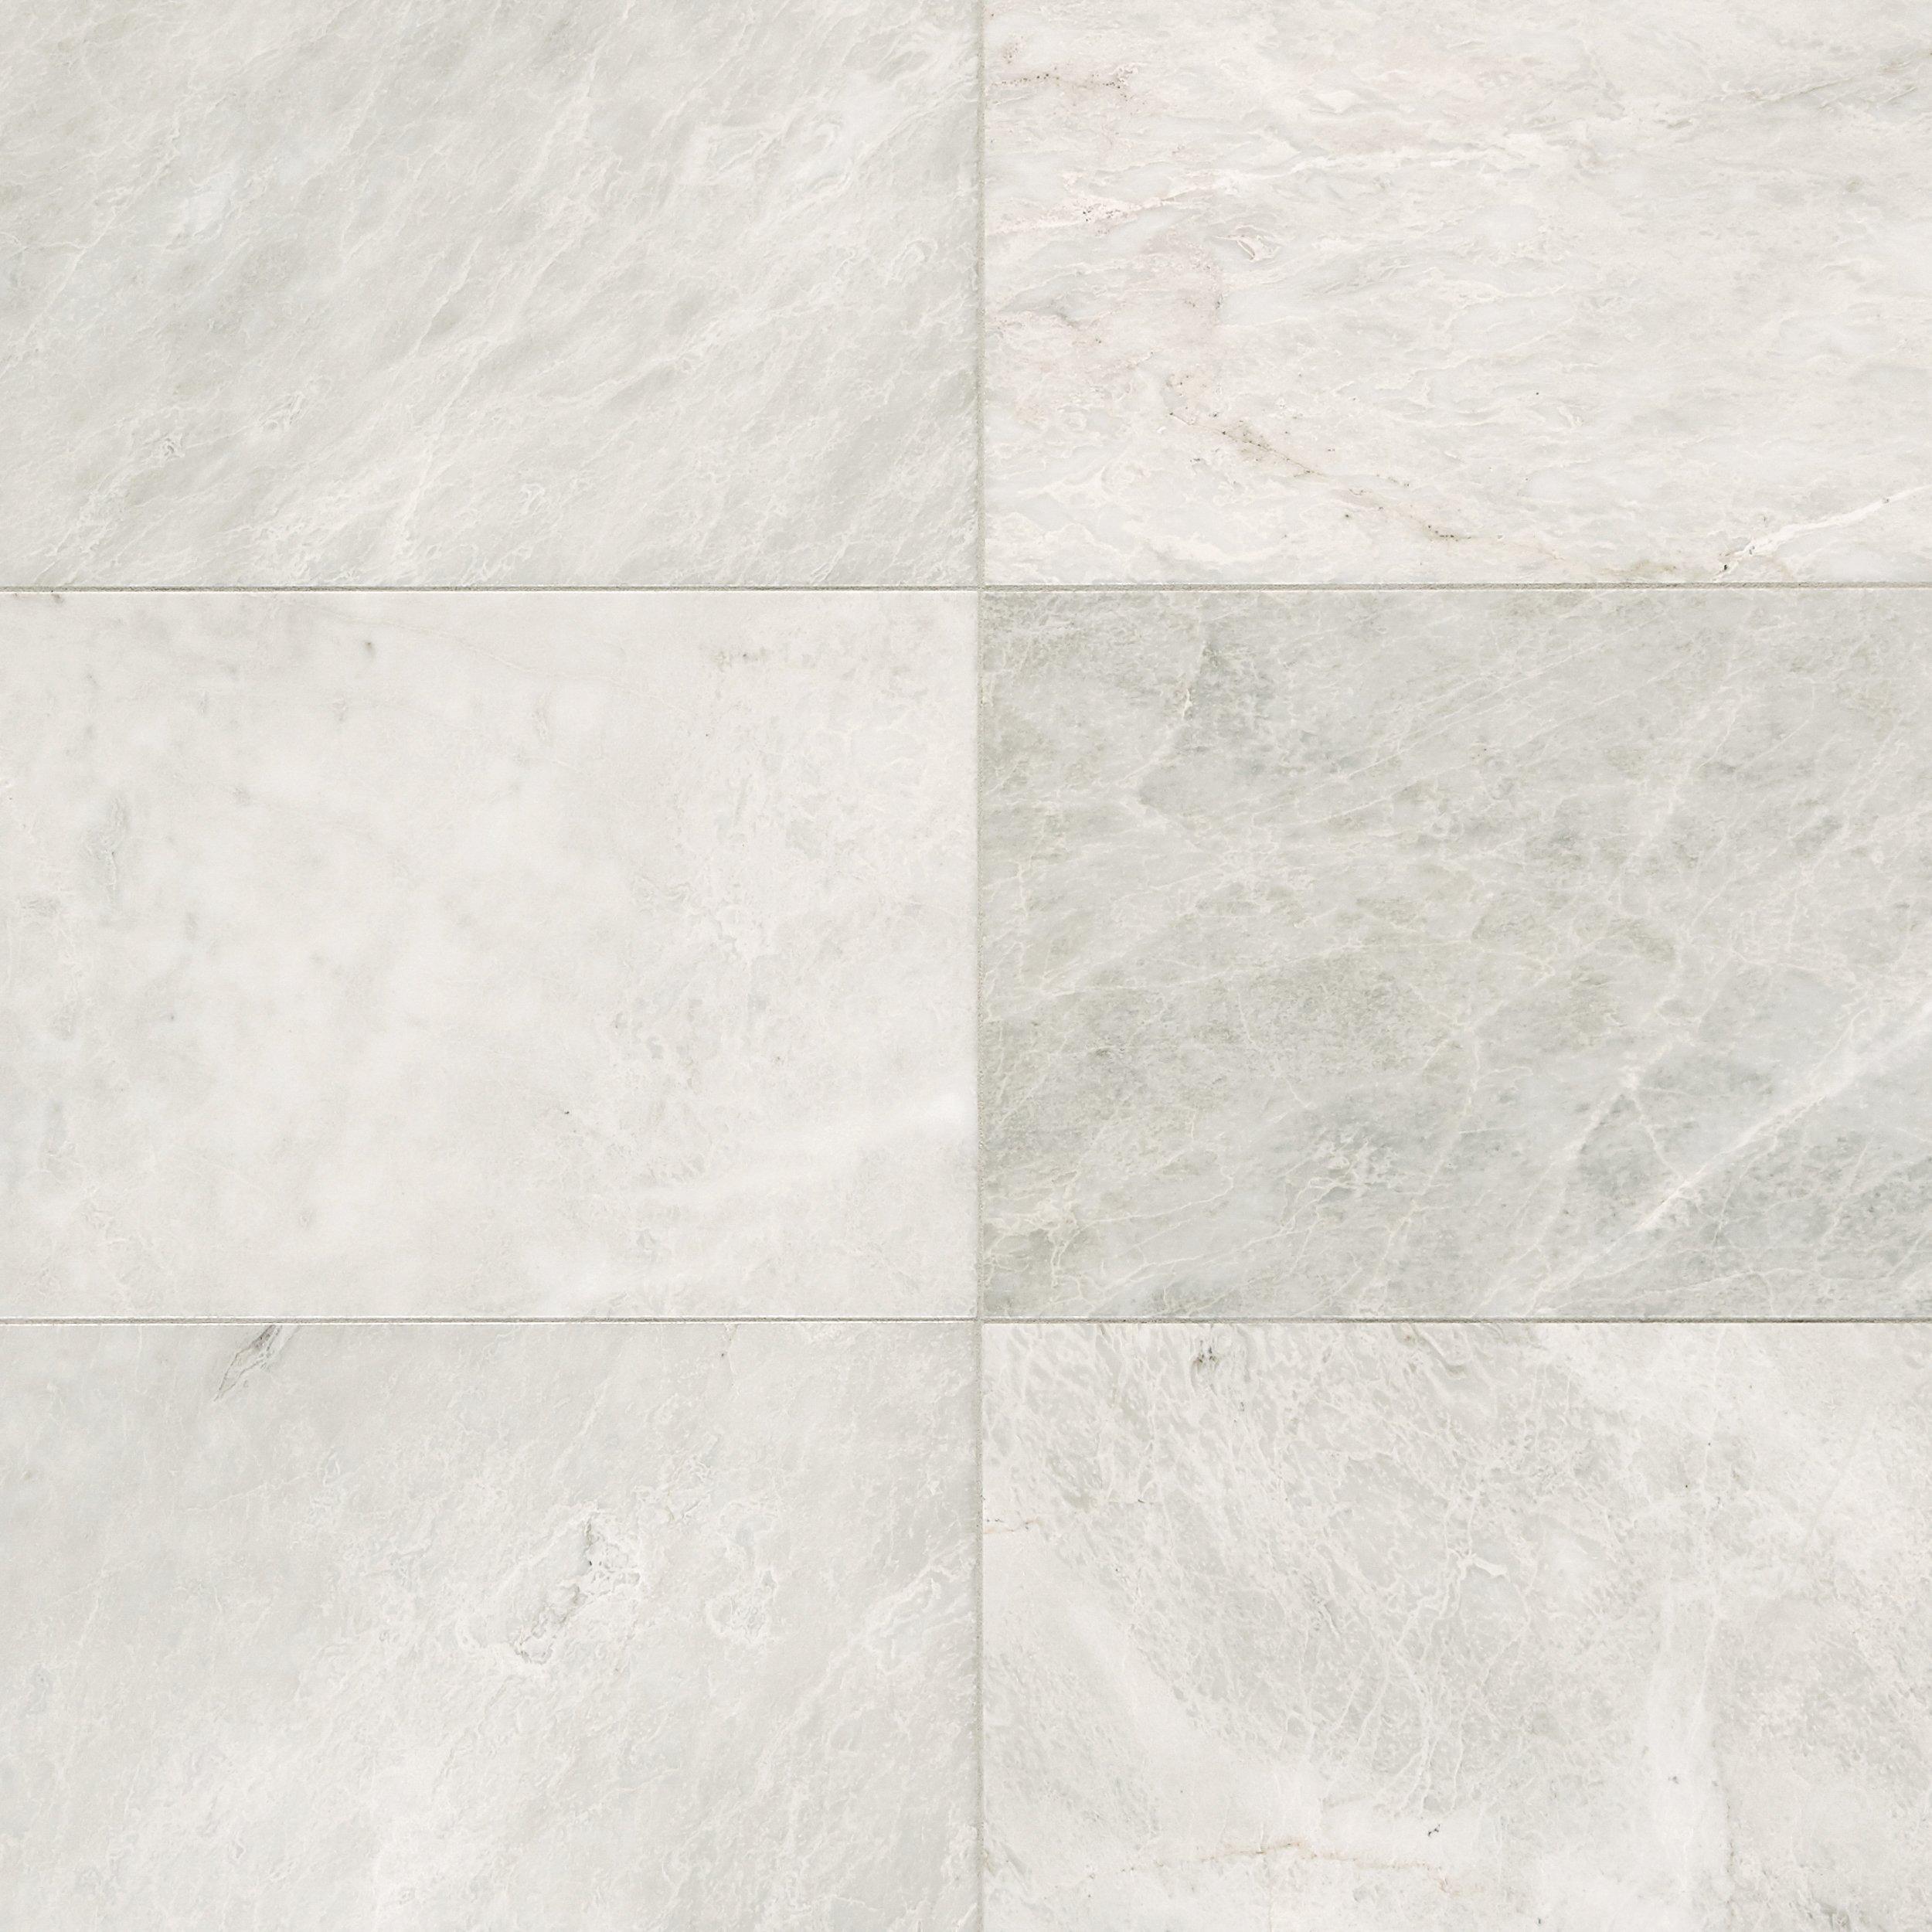 Carrara White Honed Marble Tile 12 X 12 921100474